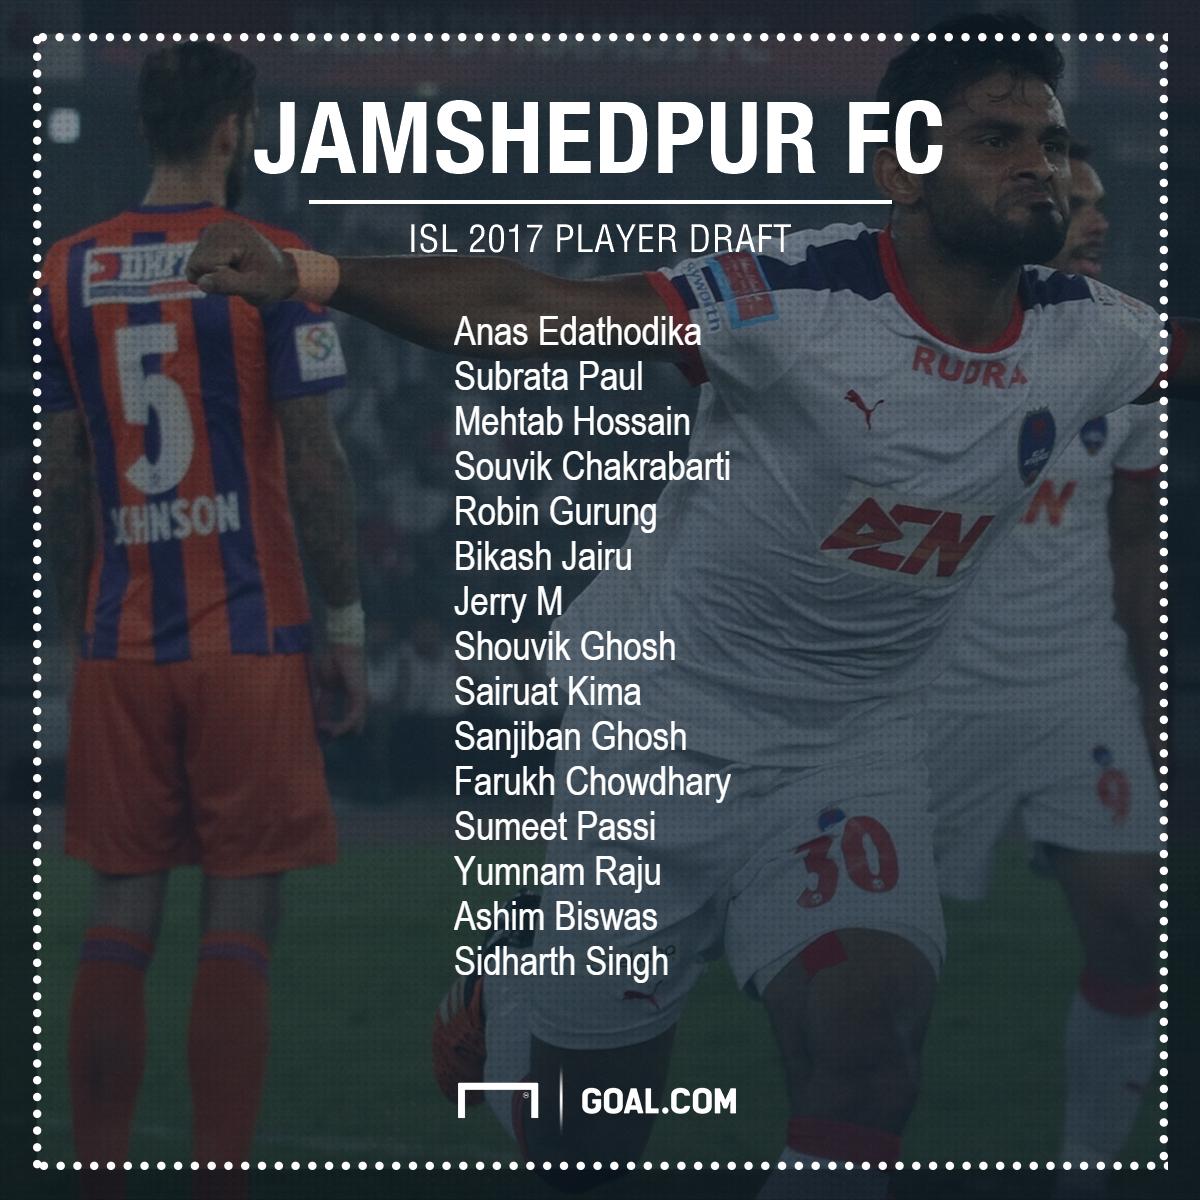 Jamshedpur FC ISL 2017 Player Draft